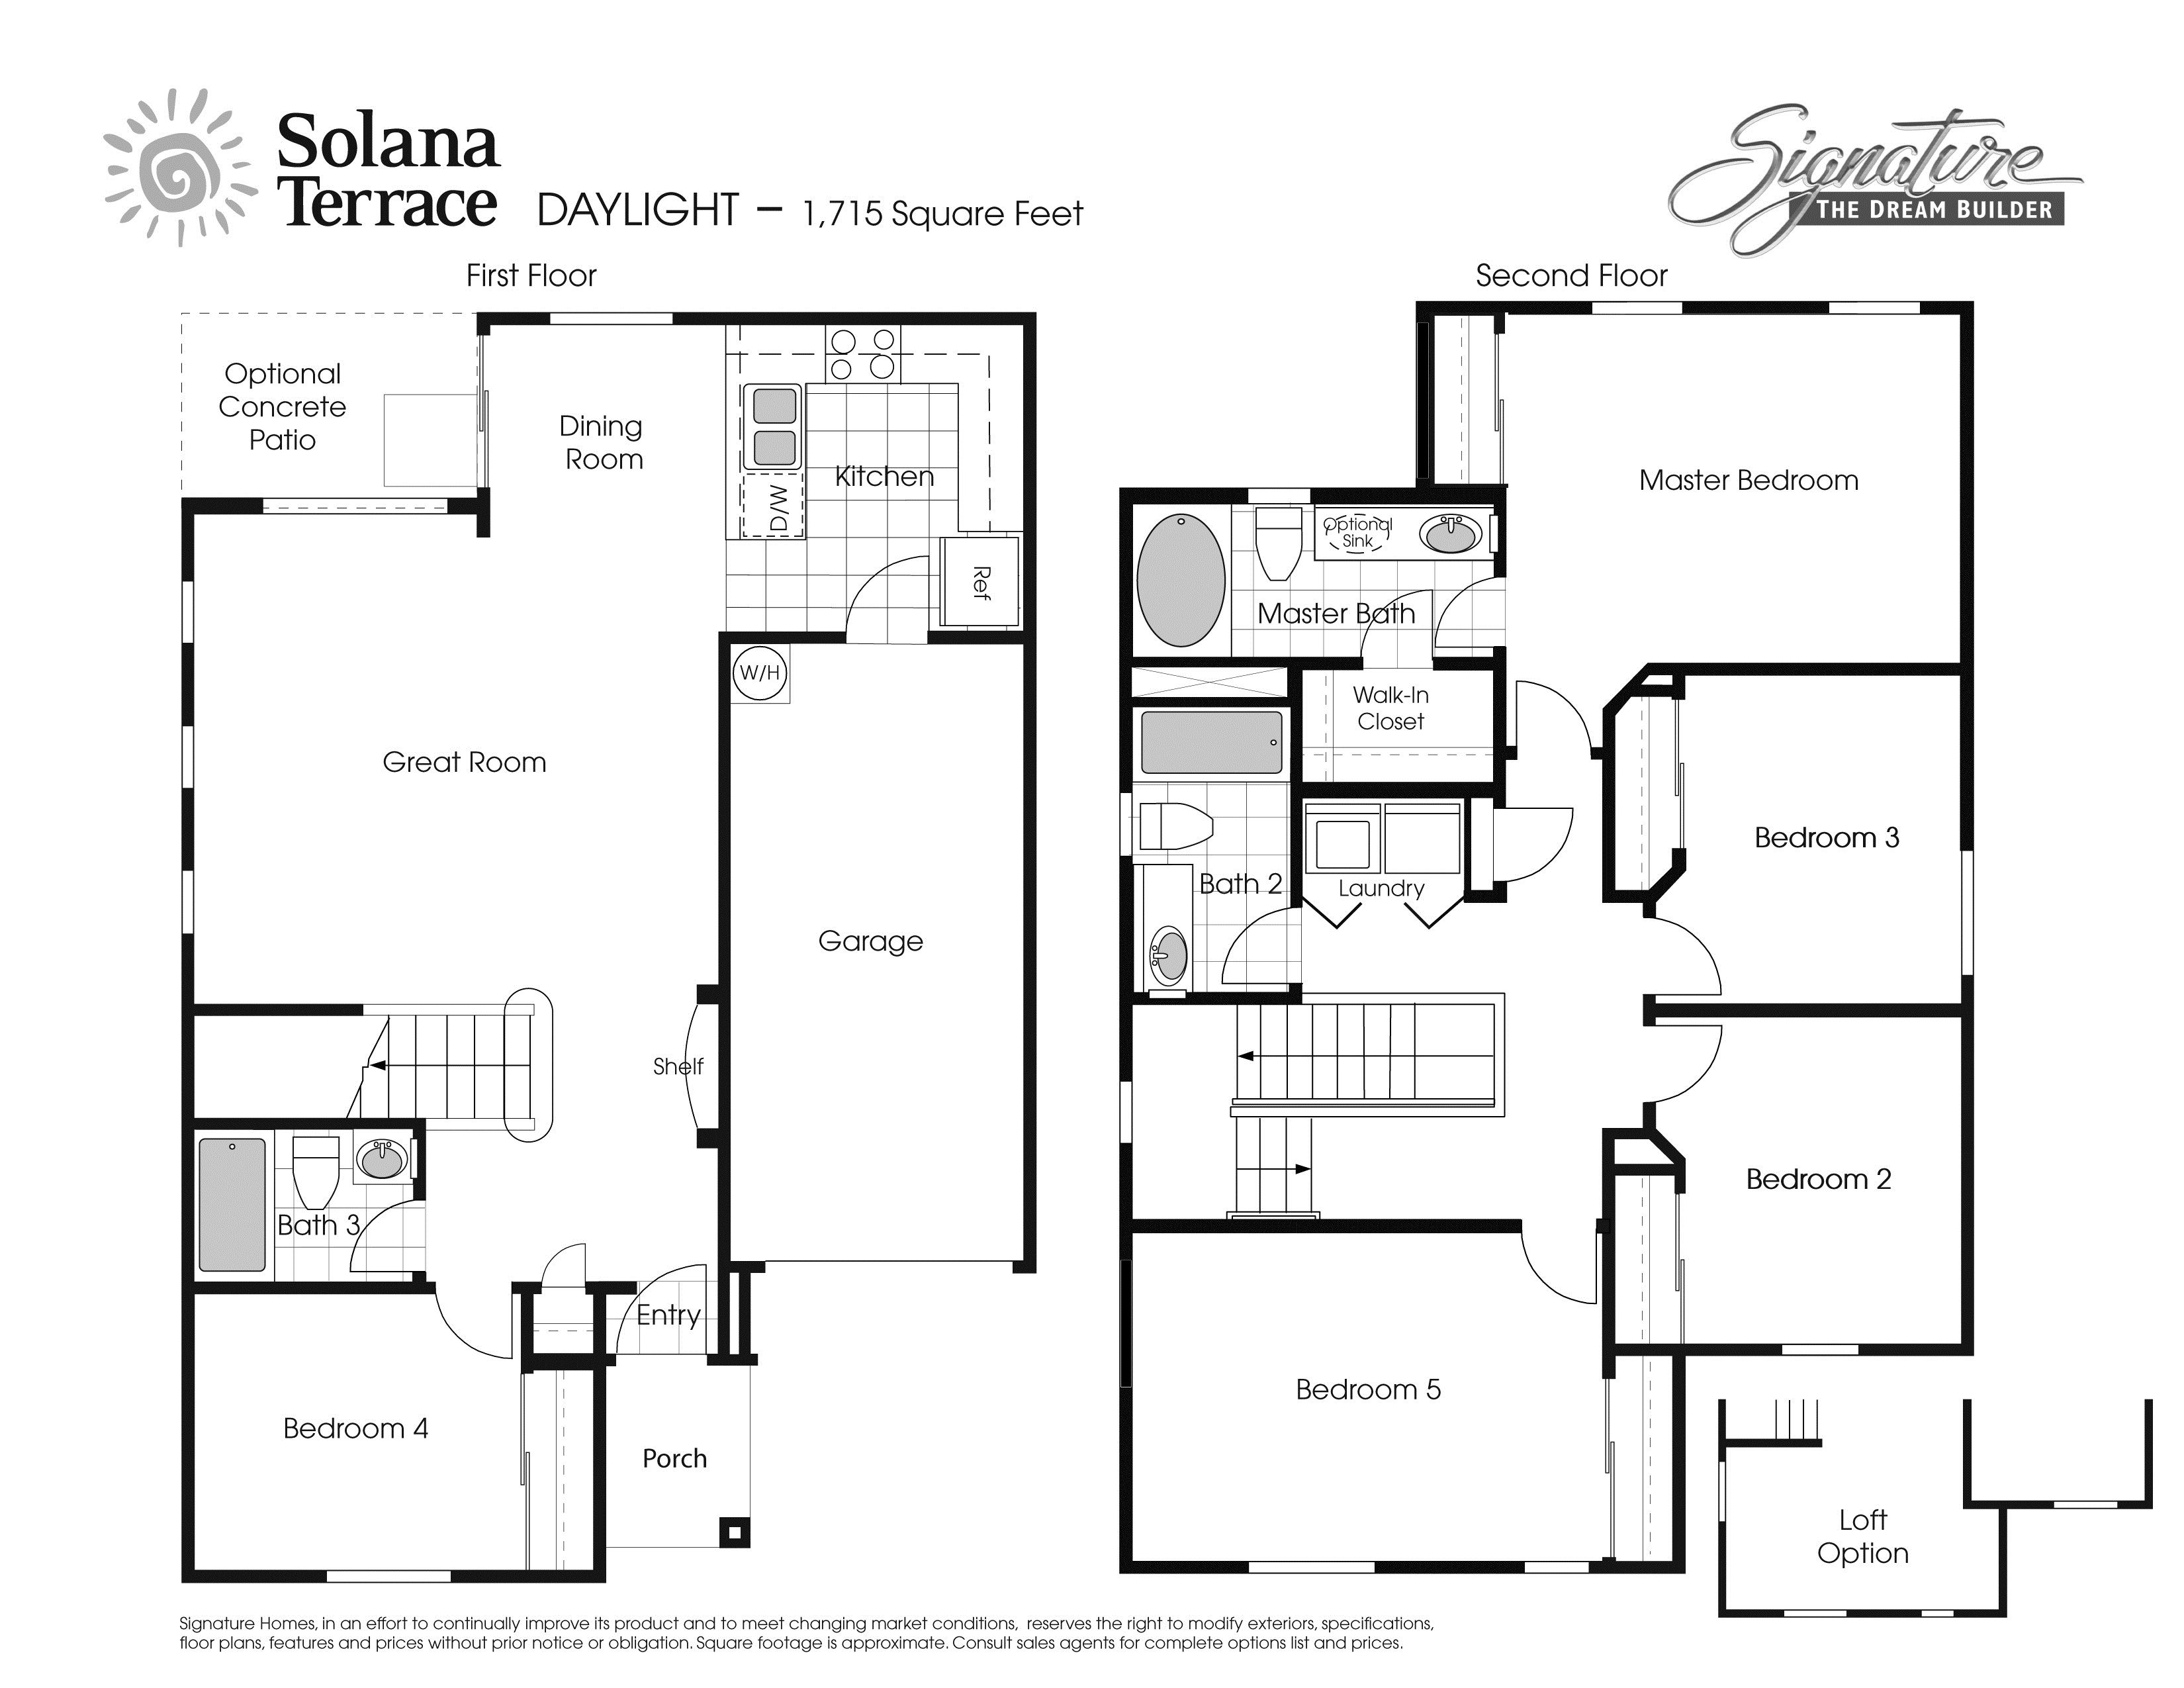 Daylight Plan Las Vegas Nevada 89115 Daylight Plan at Solana – Nellis Afb Housing Floor Plans